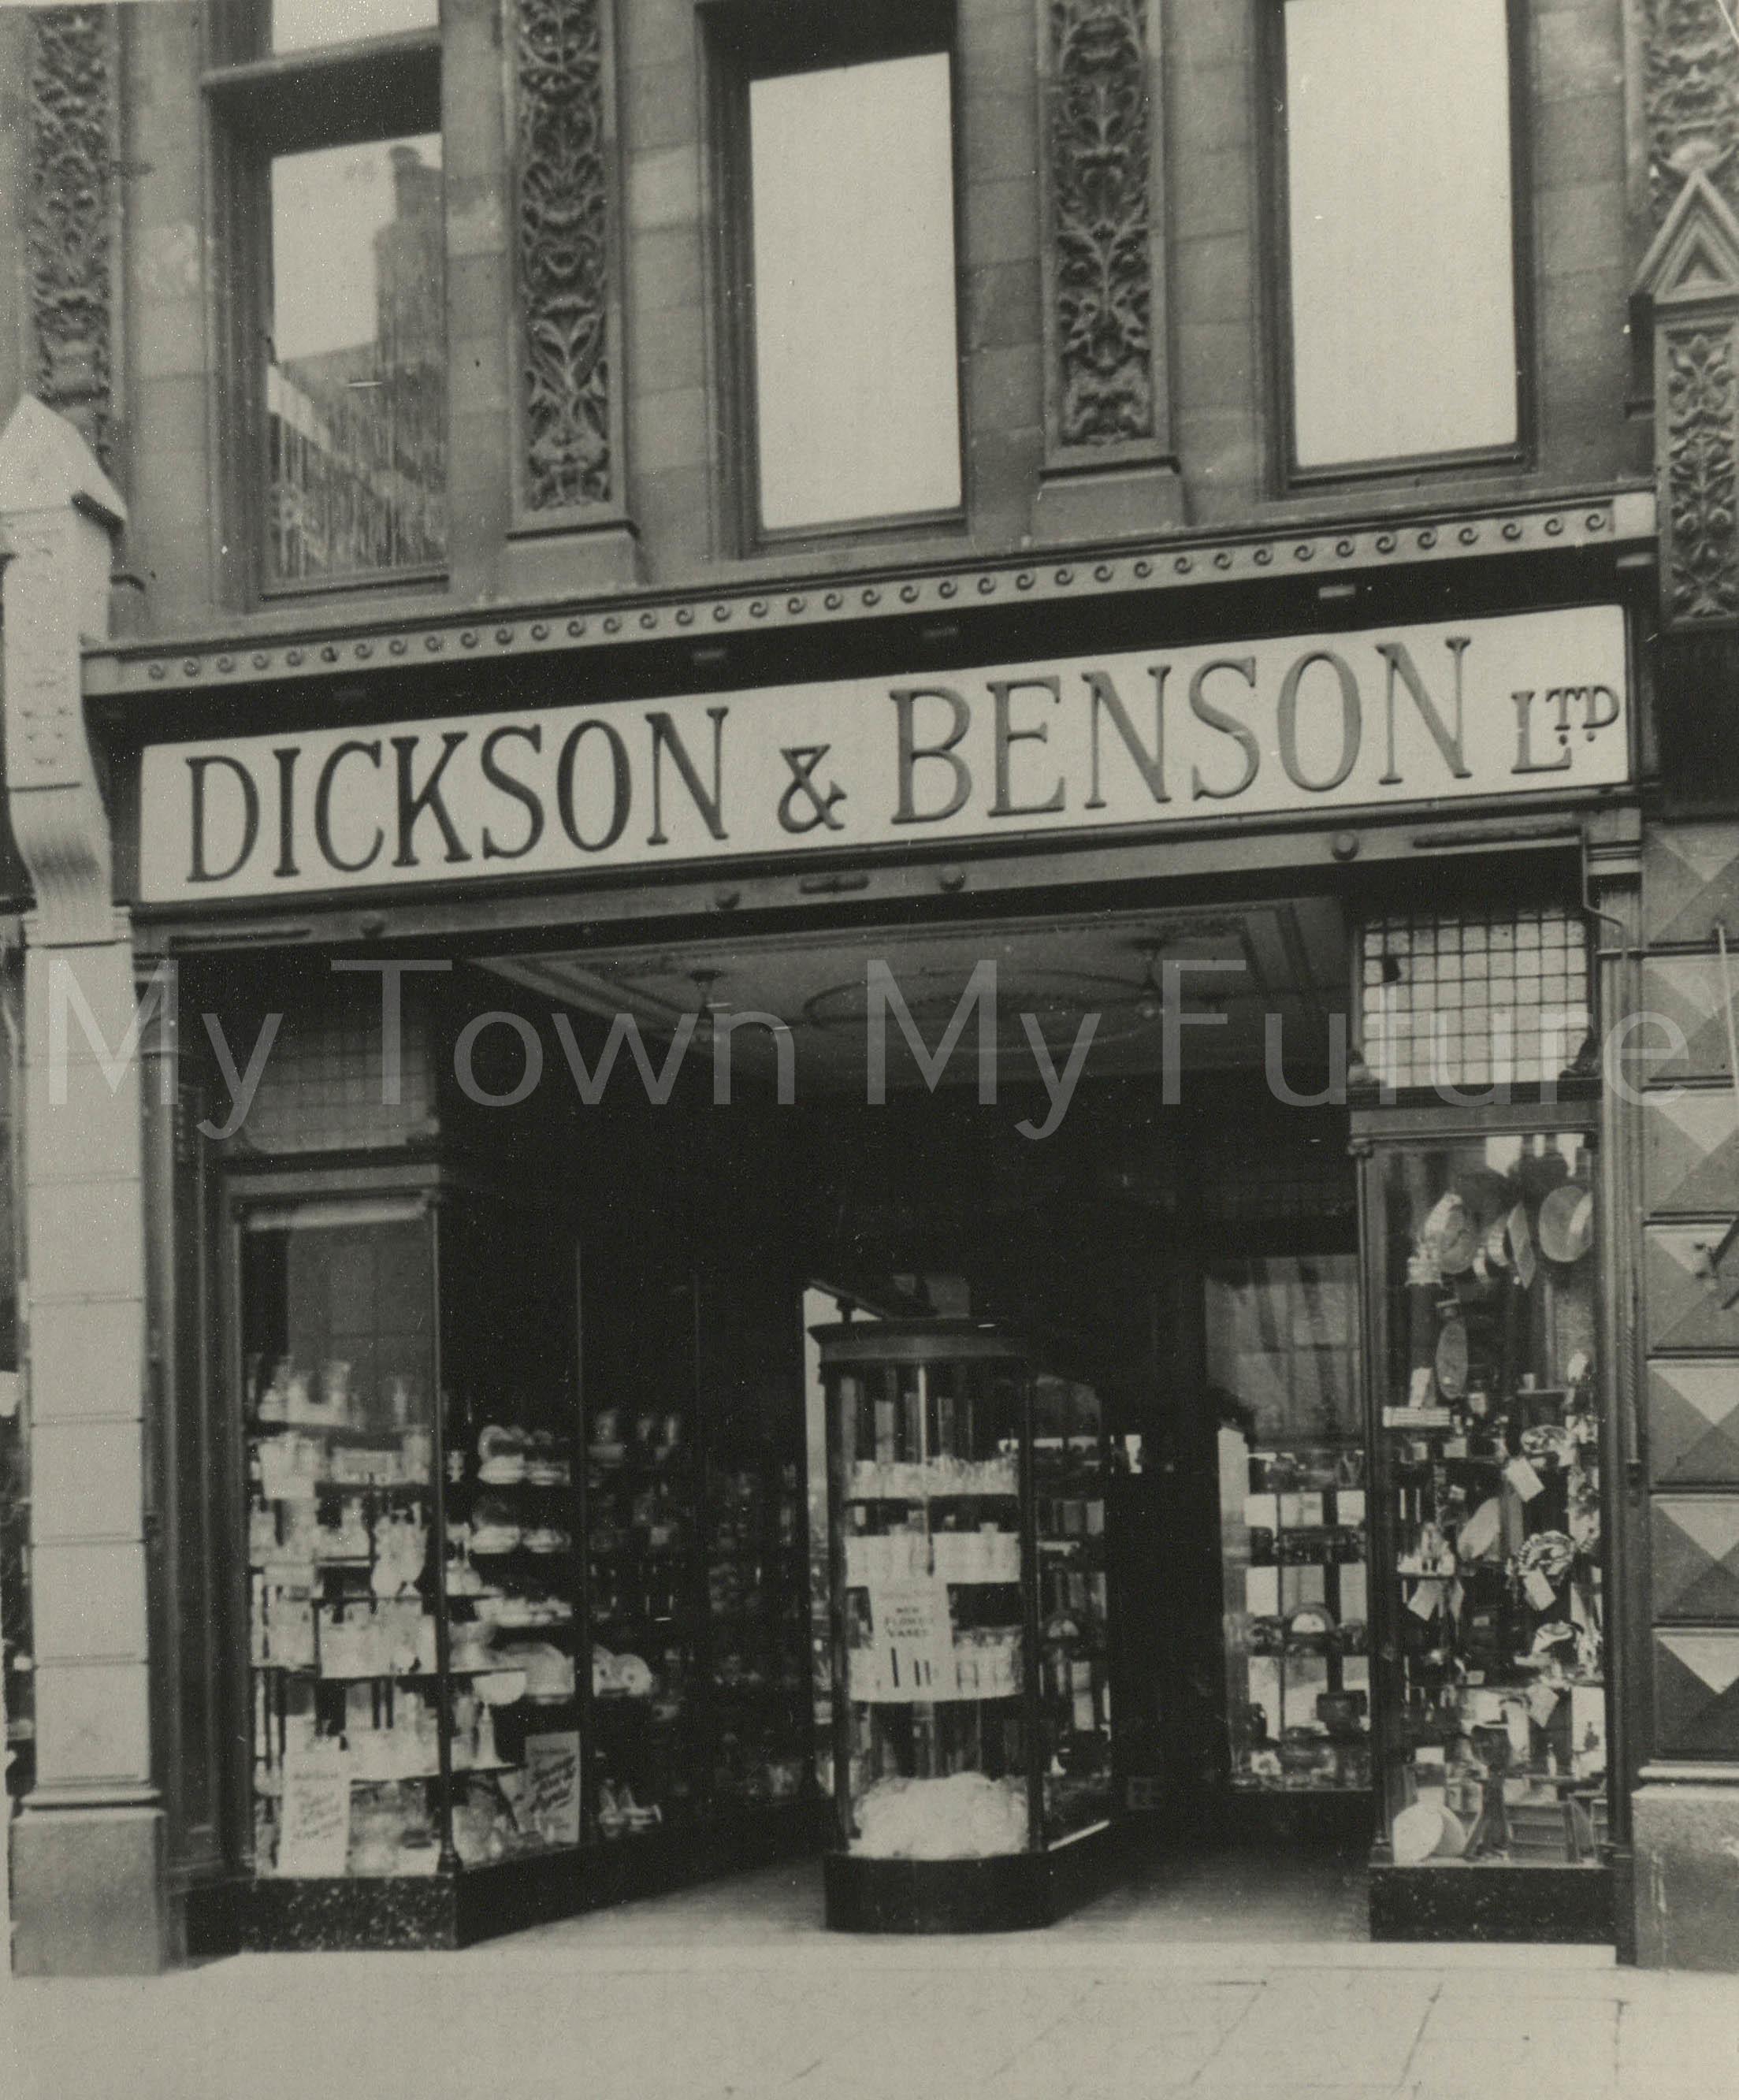 dickson & benson ltd